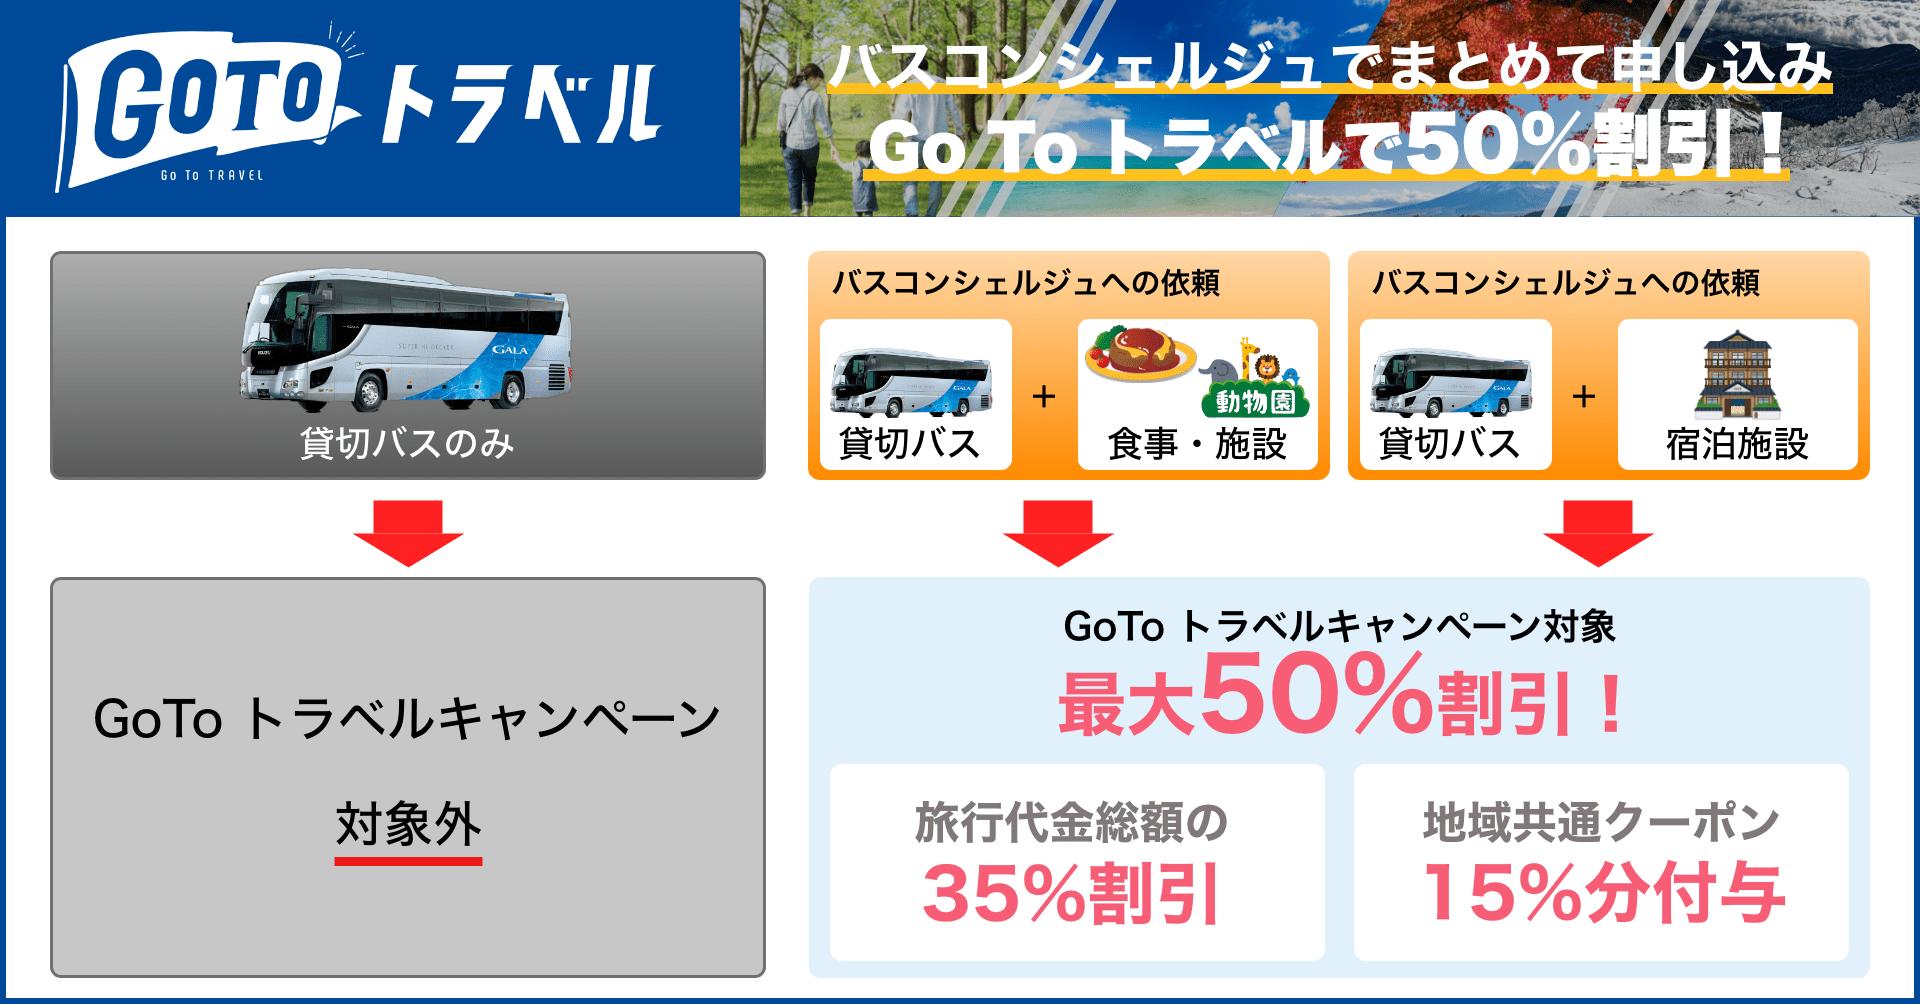 GoToトラベルで50%割引!